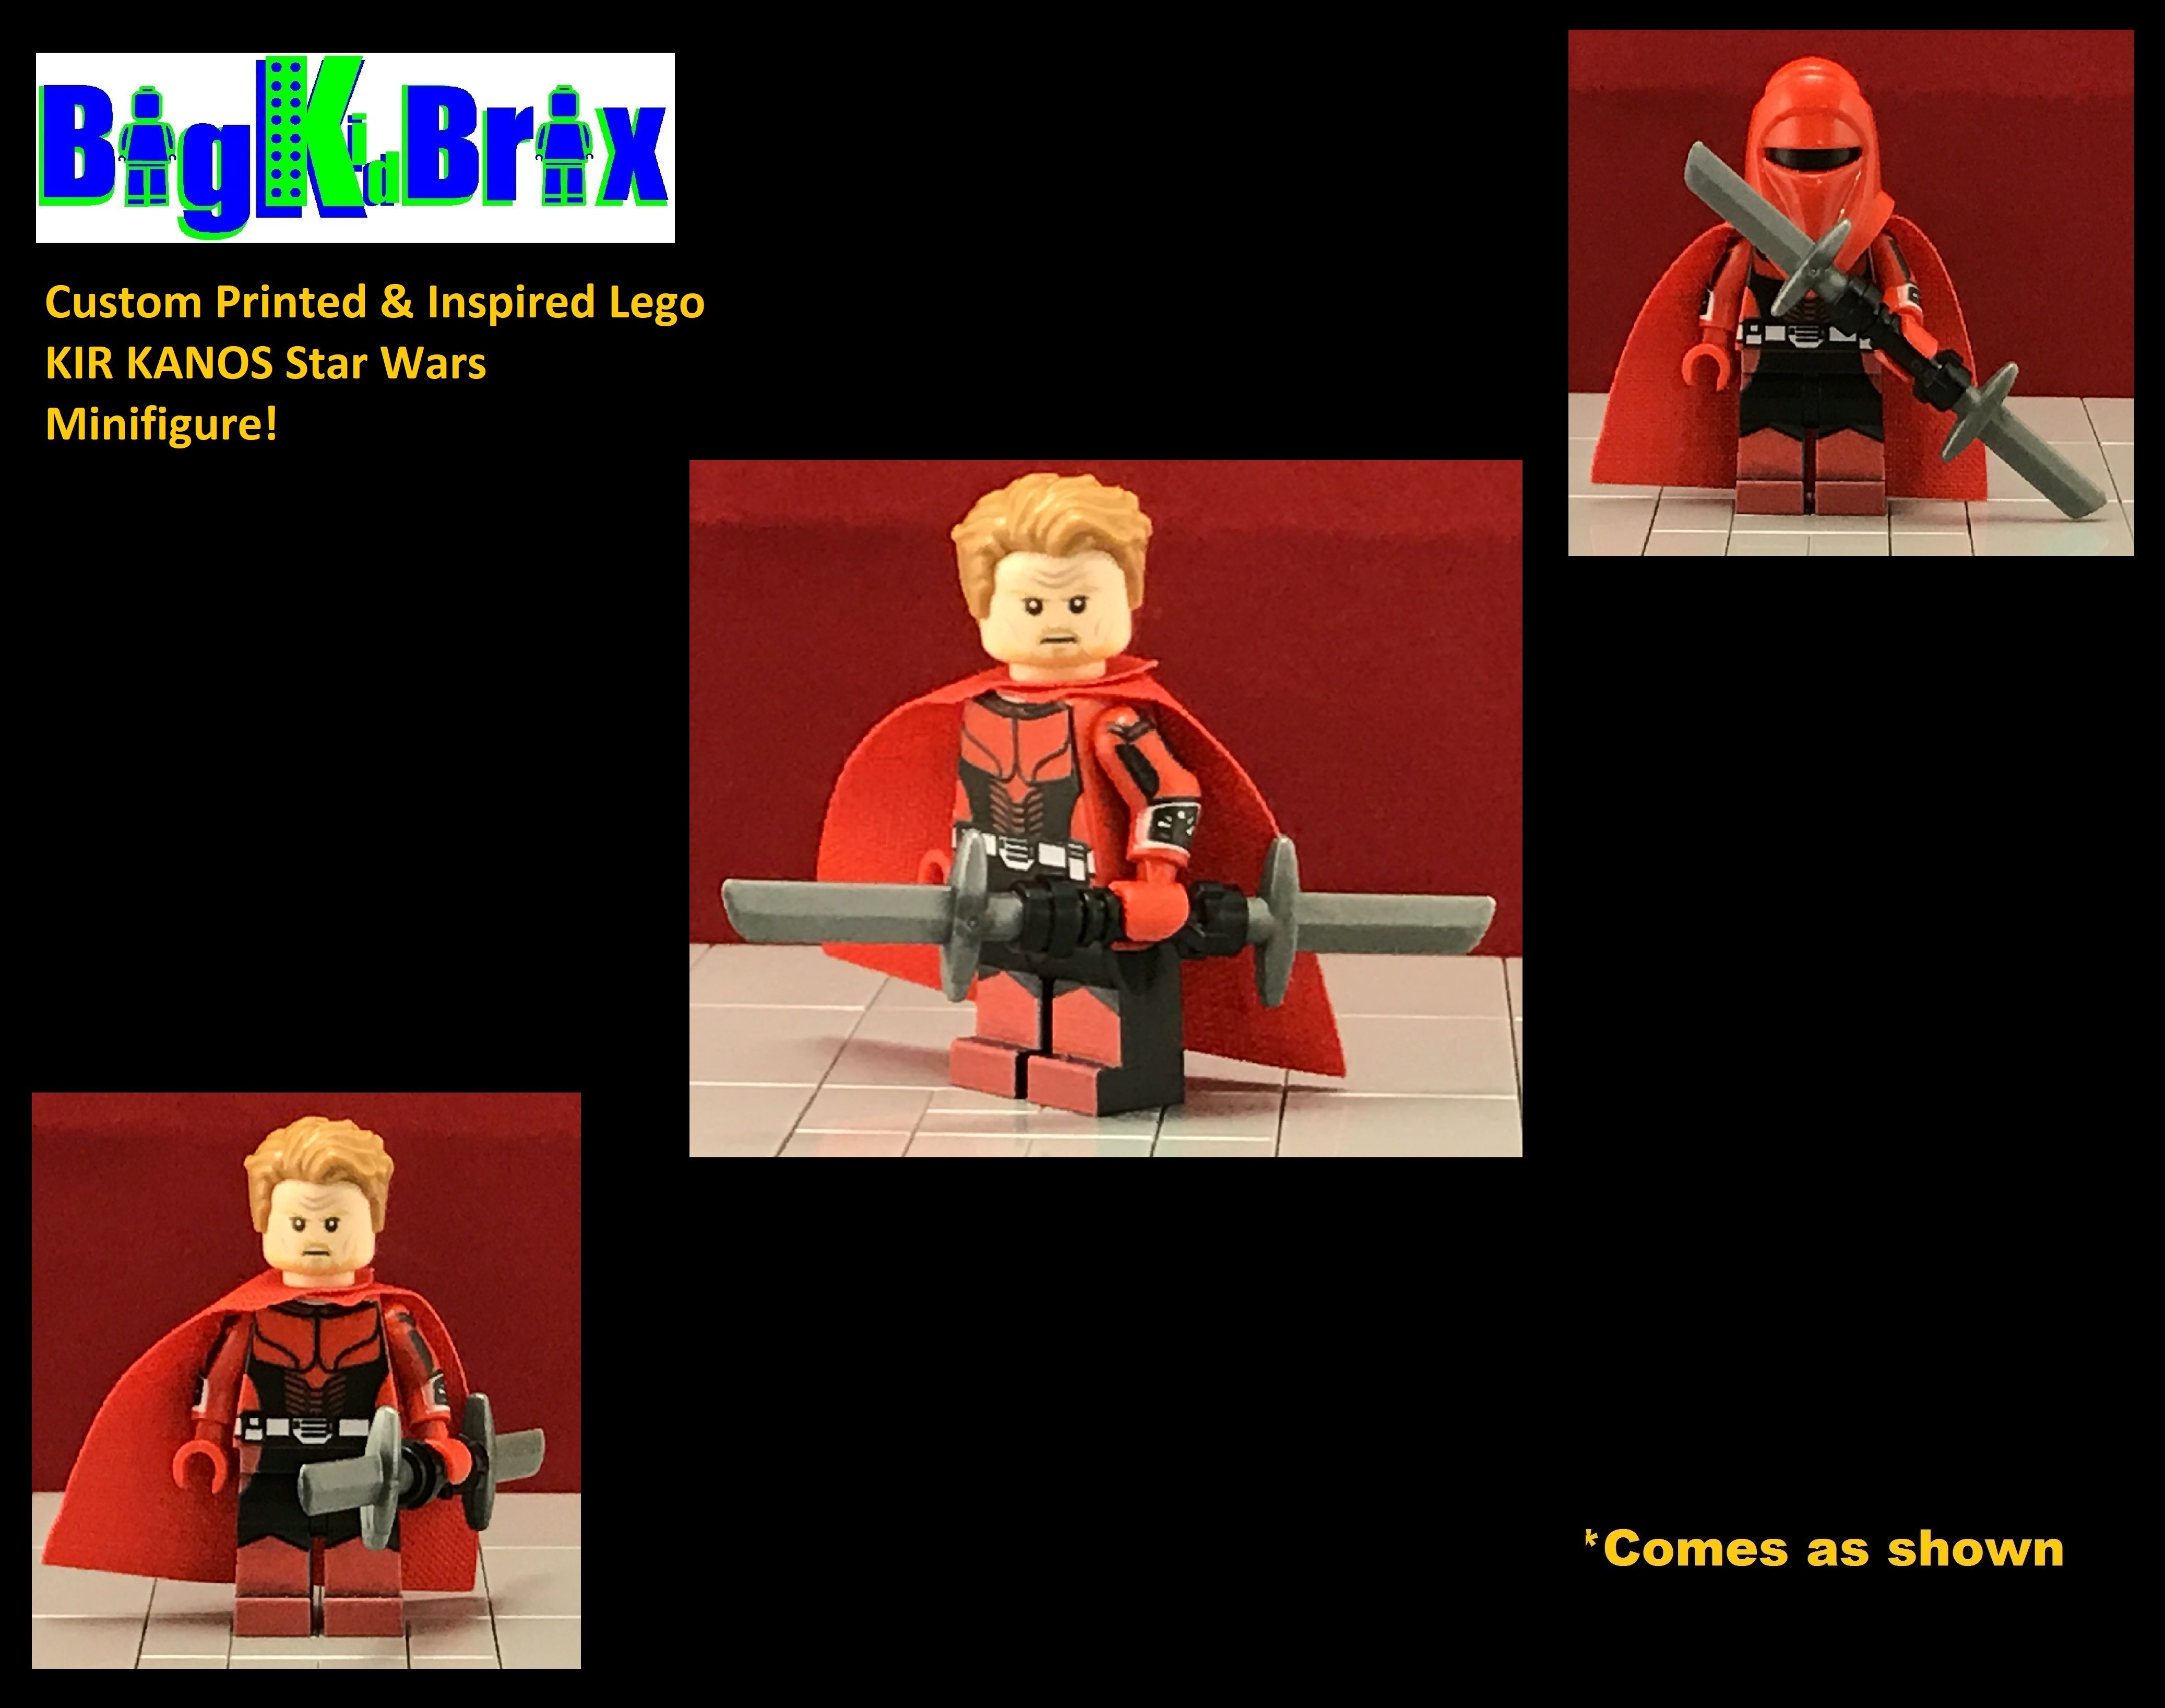 KIR KANOS Custom Printed /& Inspired Lego Star Wars Elite Guard Minifigure